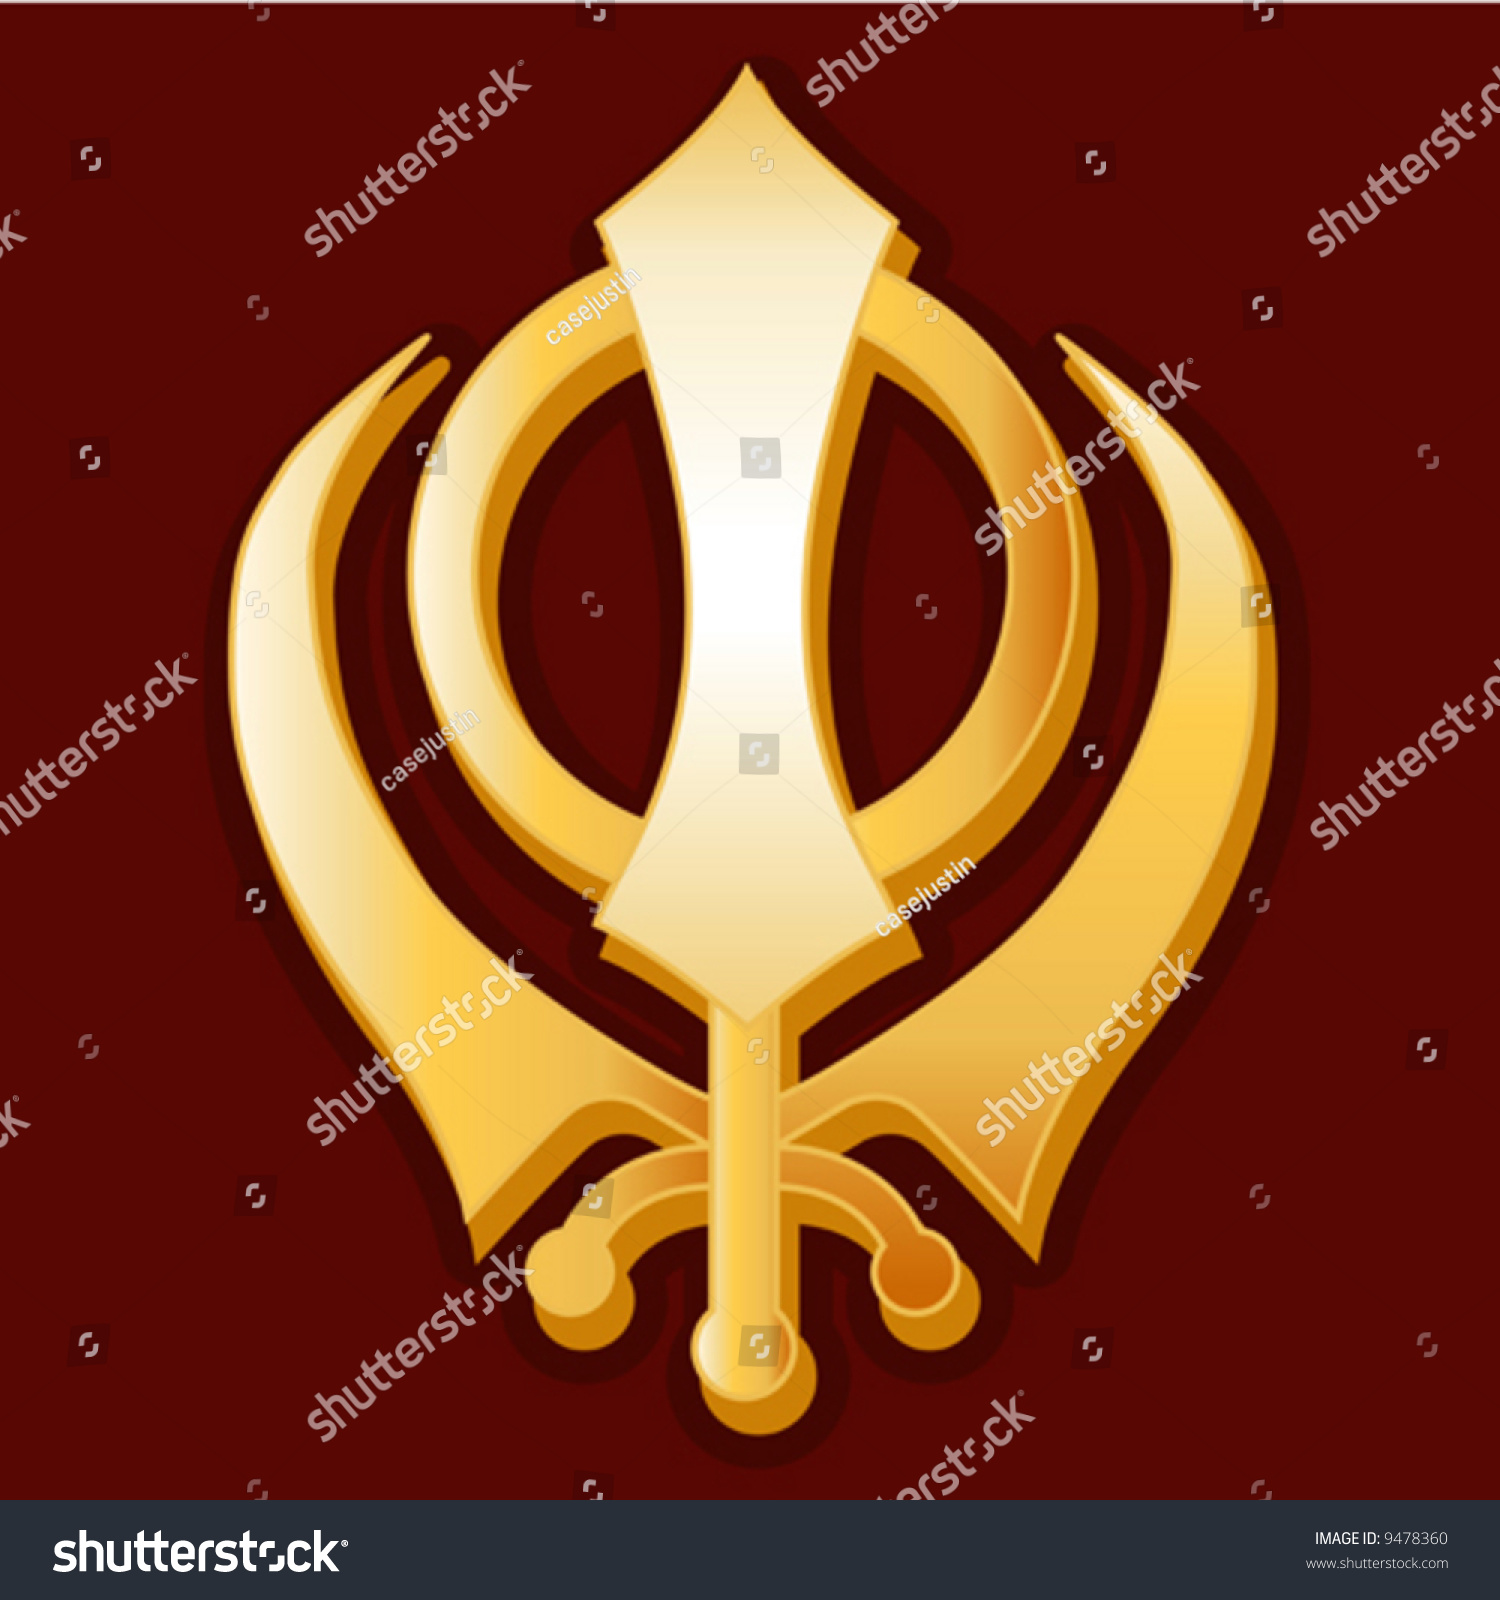 Royalty free vector sikh symbol golden khanda 9478360 stock sikh symbol golden khanda symbol of the sikh faith on a crimson background biocorpaavc